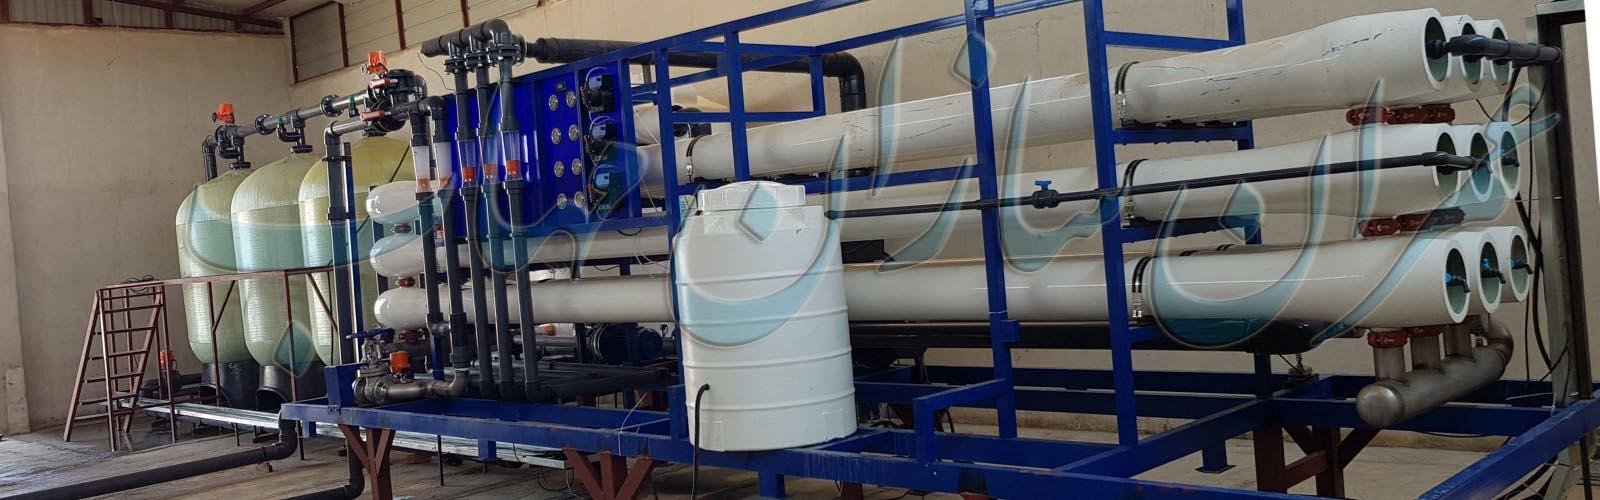 دستگاه تصفیه آب صنعتی Industrial water filtration device